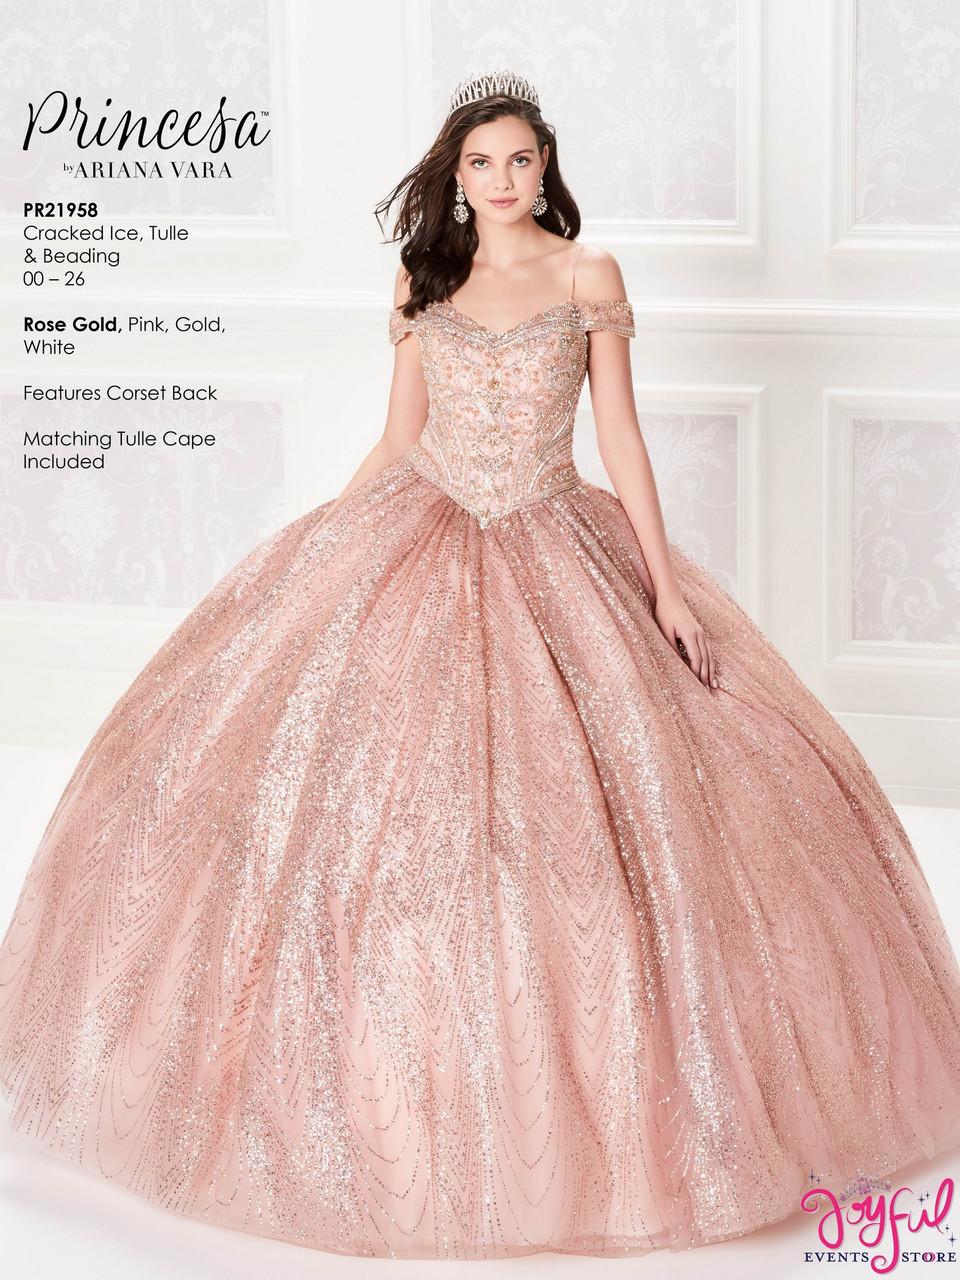 Rose Gold Quinceanera Dress Pr21958rg Joyful Events Store